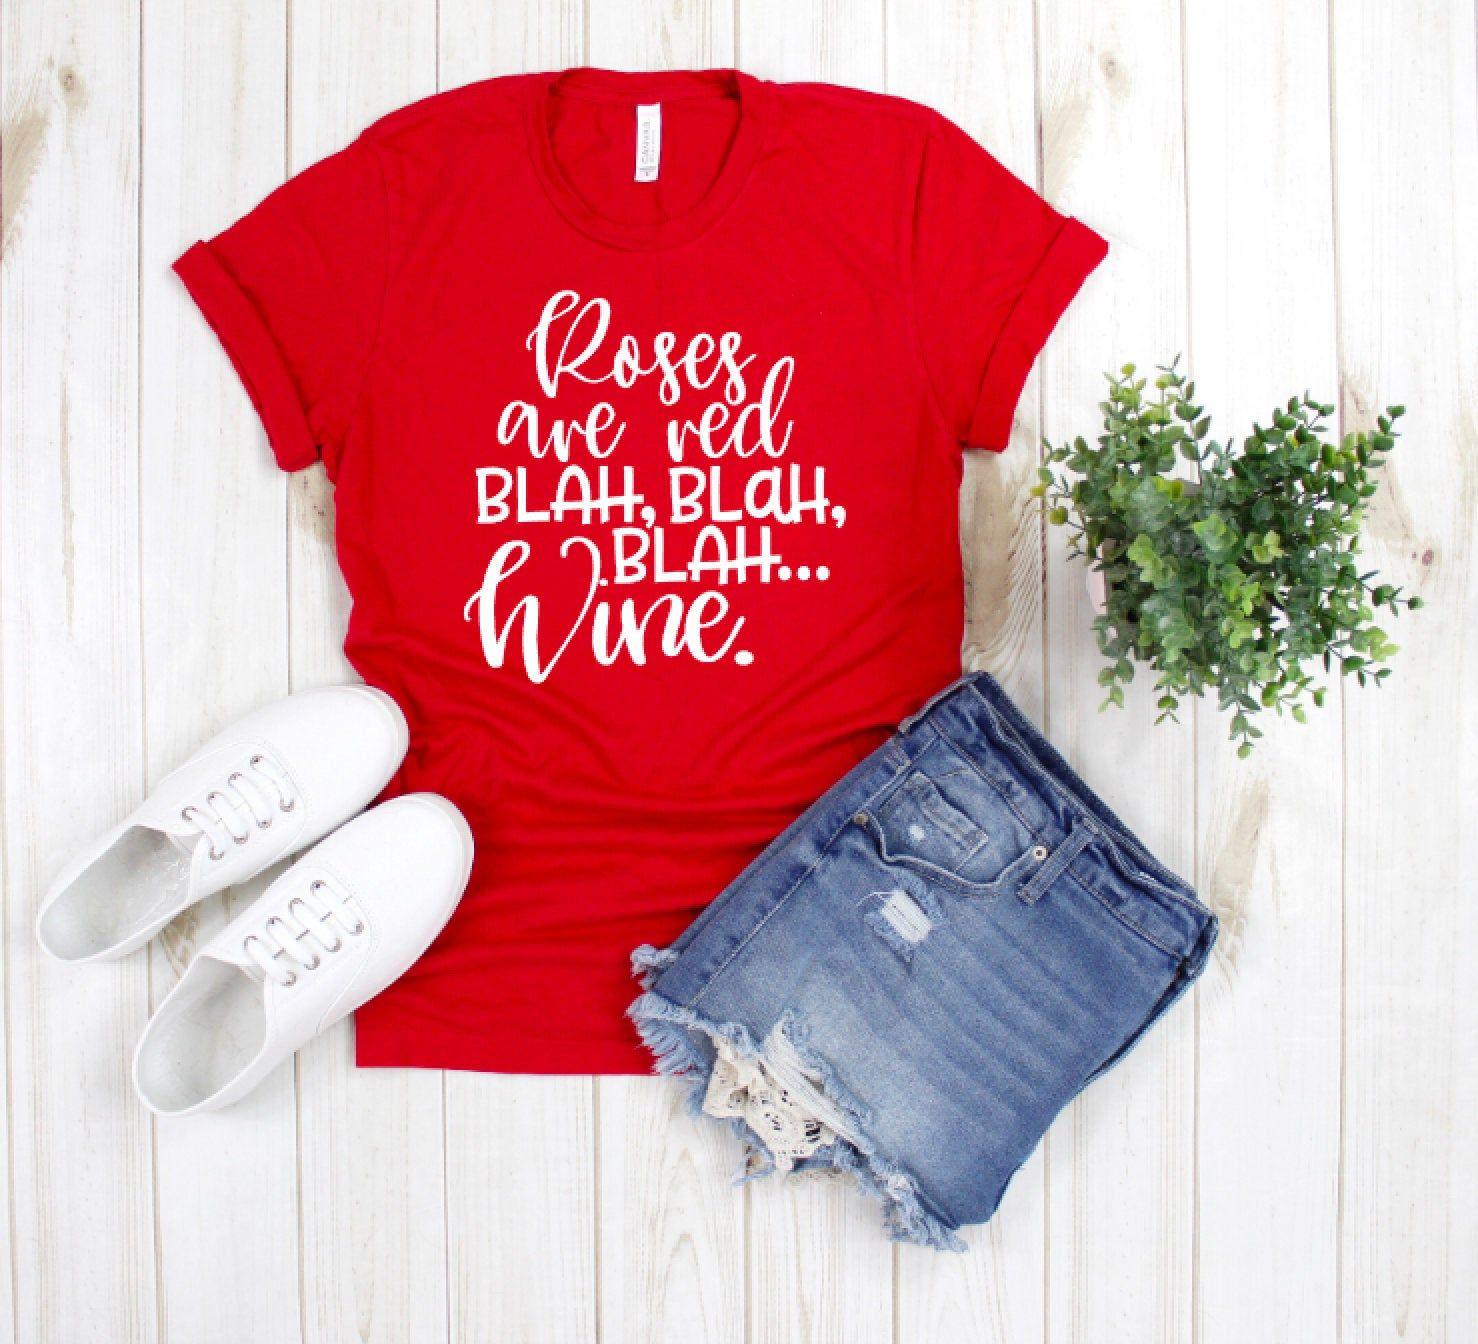 Valentines Day Wine Shirt Blah Blah Blah Wine Shirt Funny Etsy Womens Disney Shirts Fairytale Shirts Funny Shirts